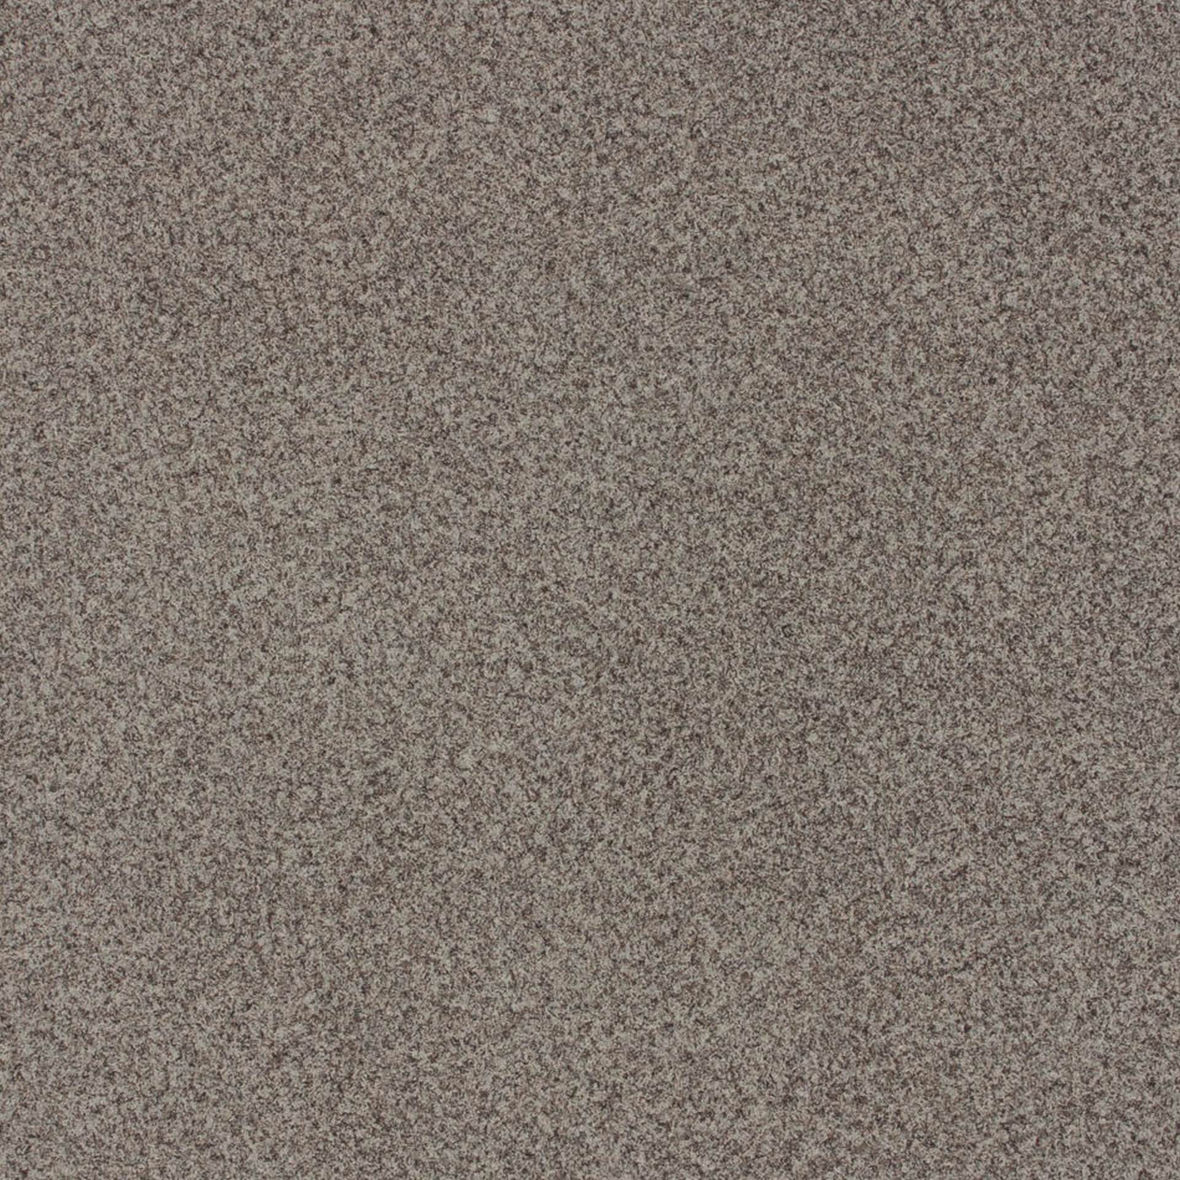 ORION 466-09 CIEMNOSZARY 4M